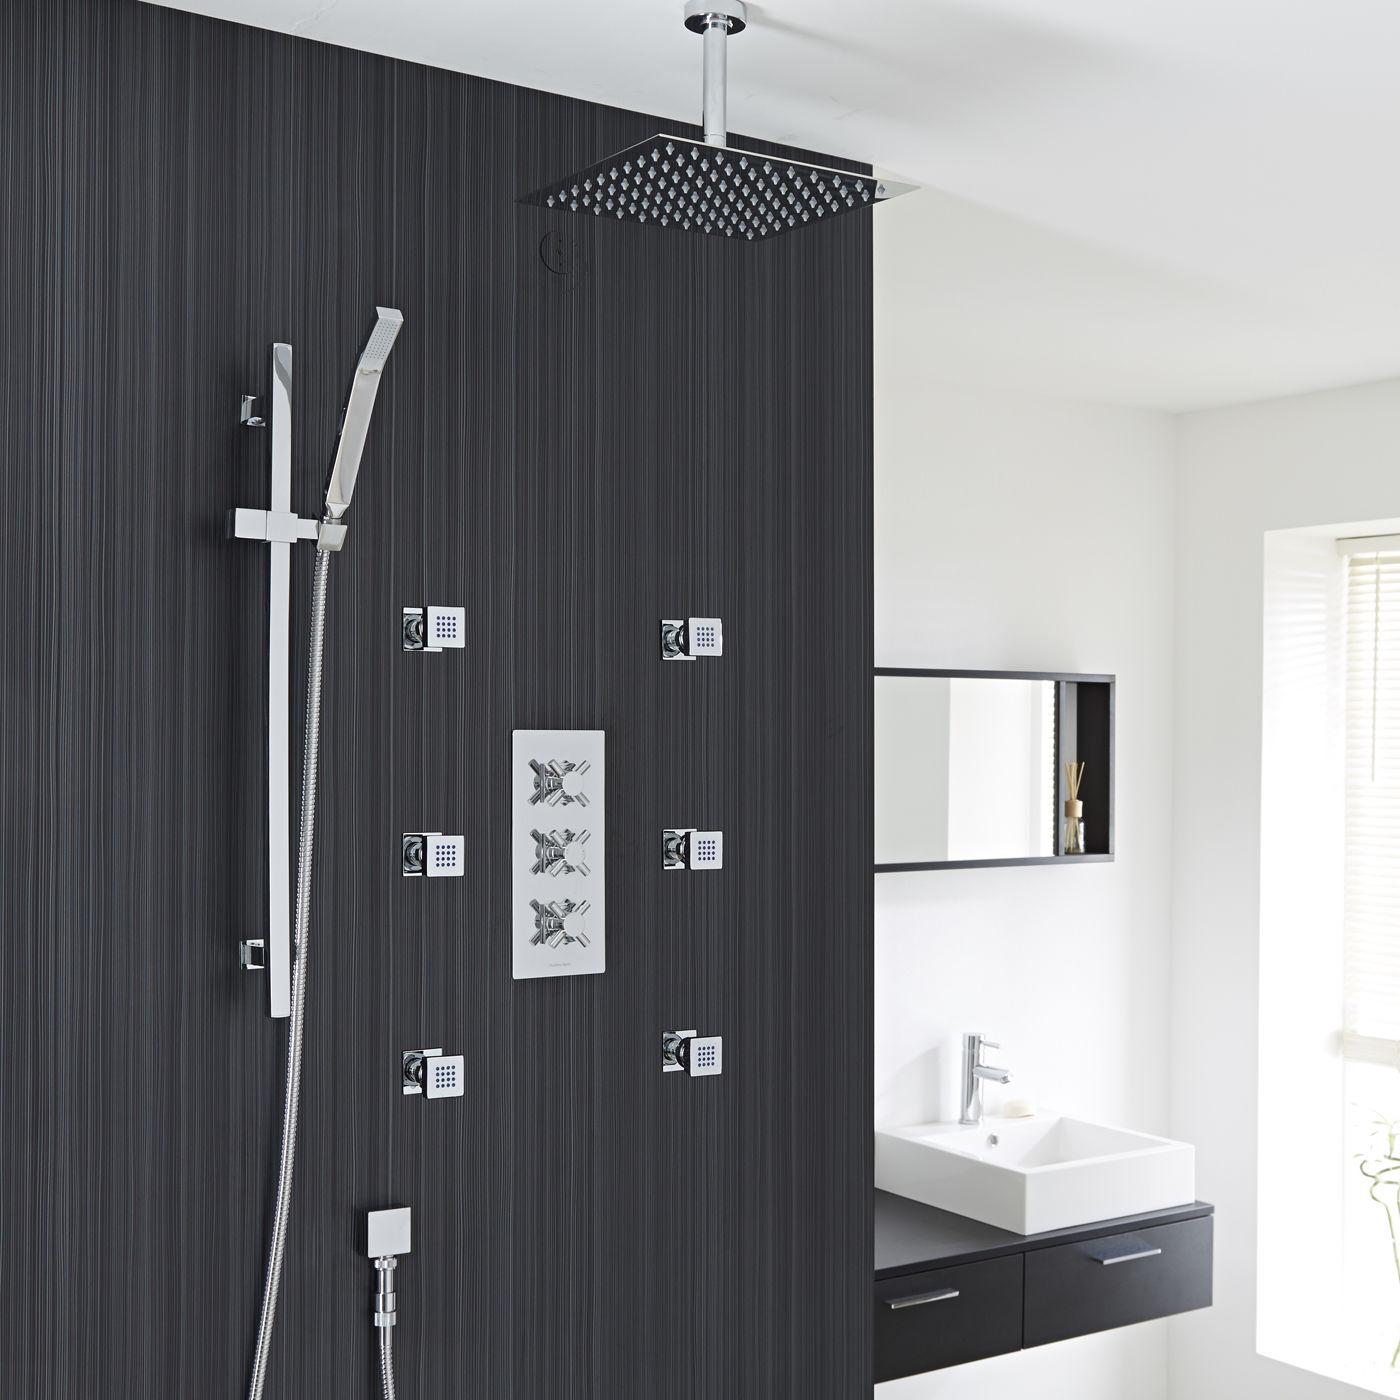 Lyon Crystal Thermostatic 3 Outlet Shower System Set